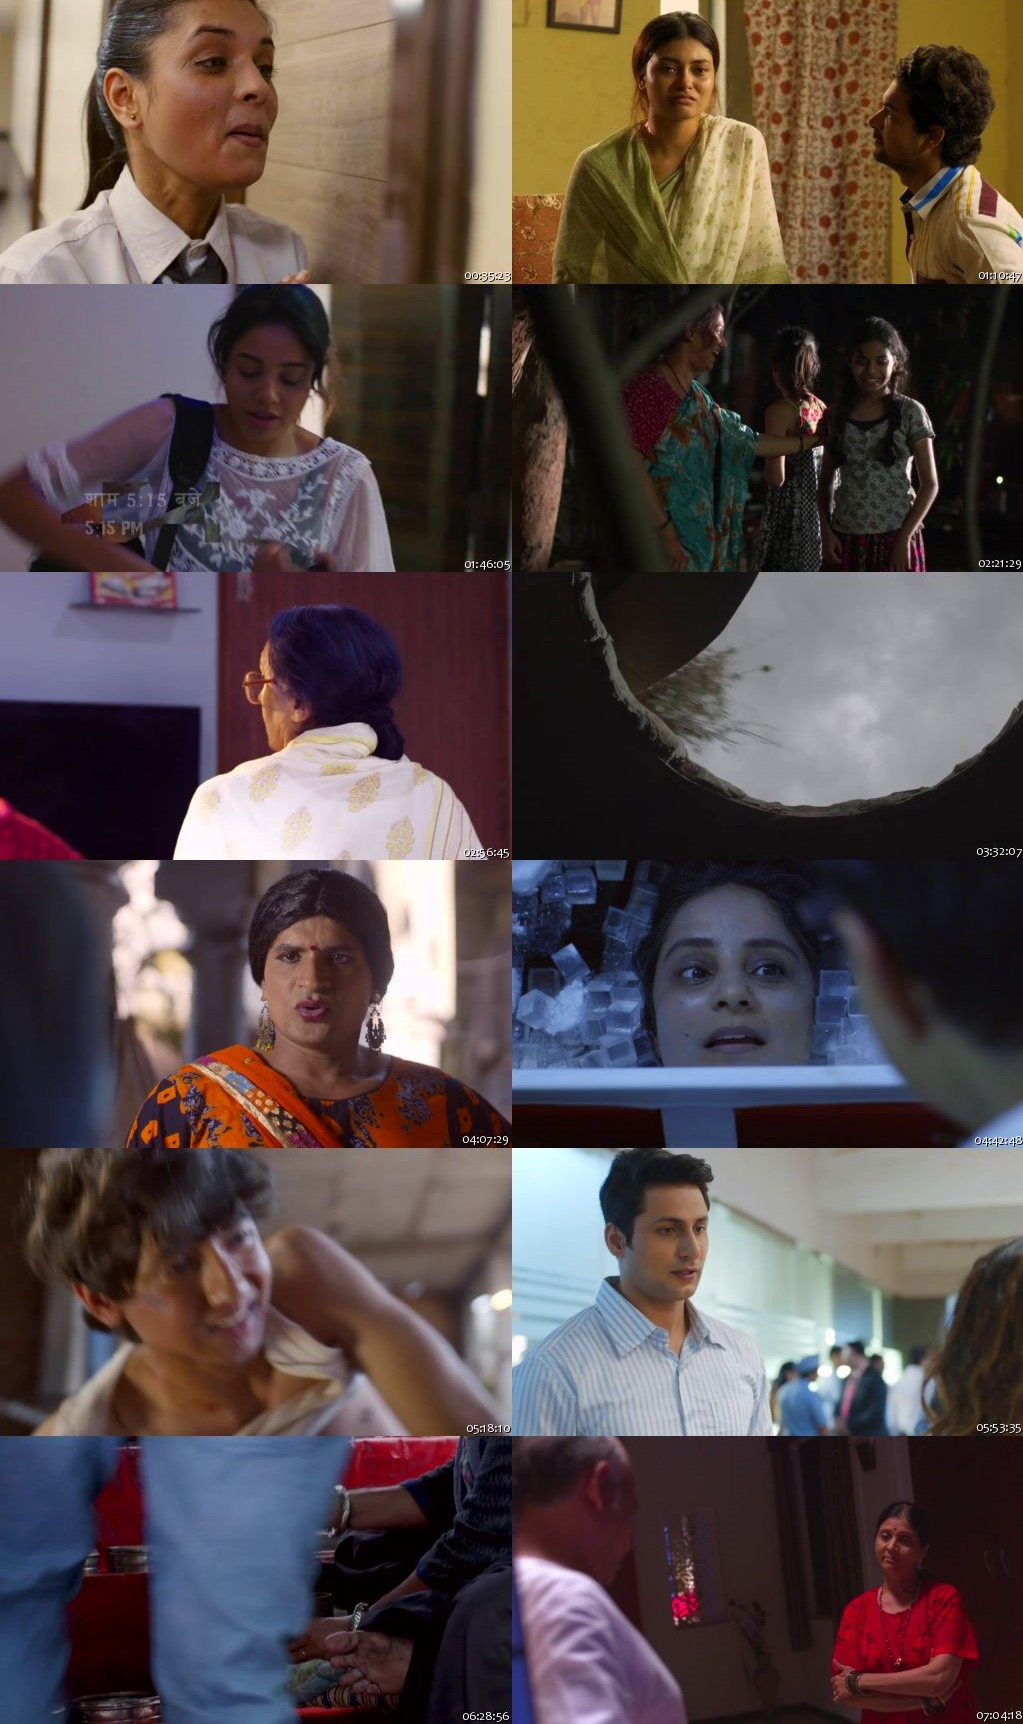 Indias Most Sansanikhez Kahaniyan 2021 All Episodes HDRip 720p Season 1